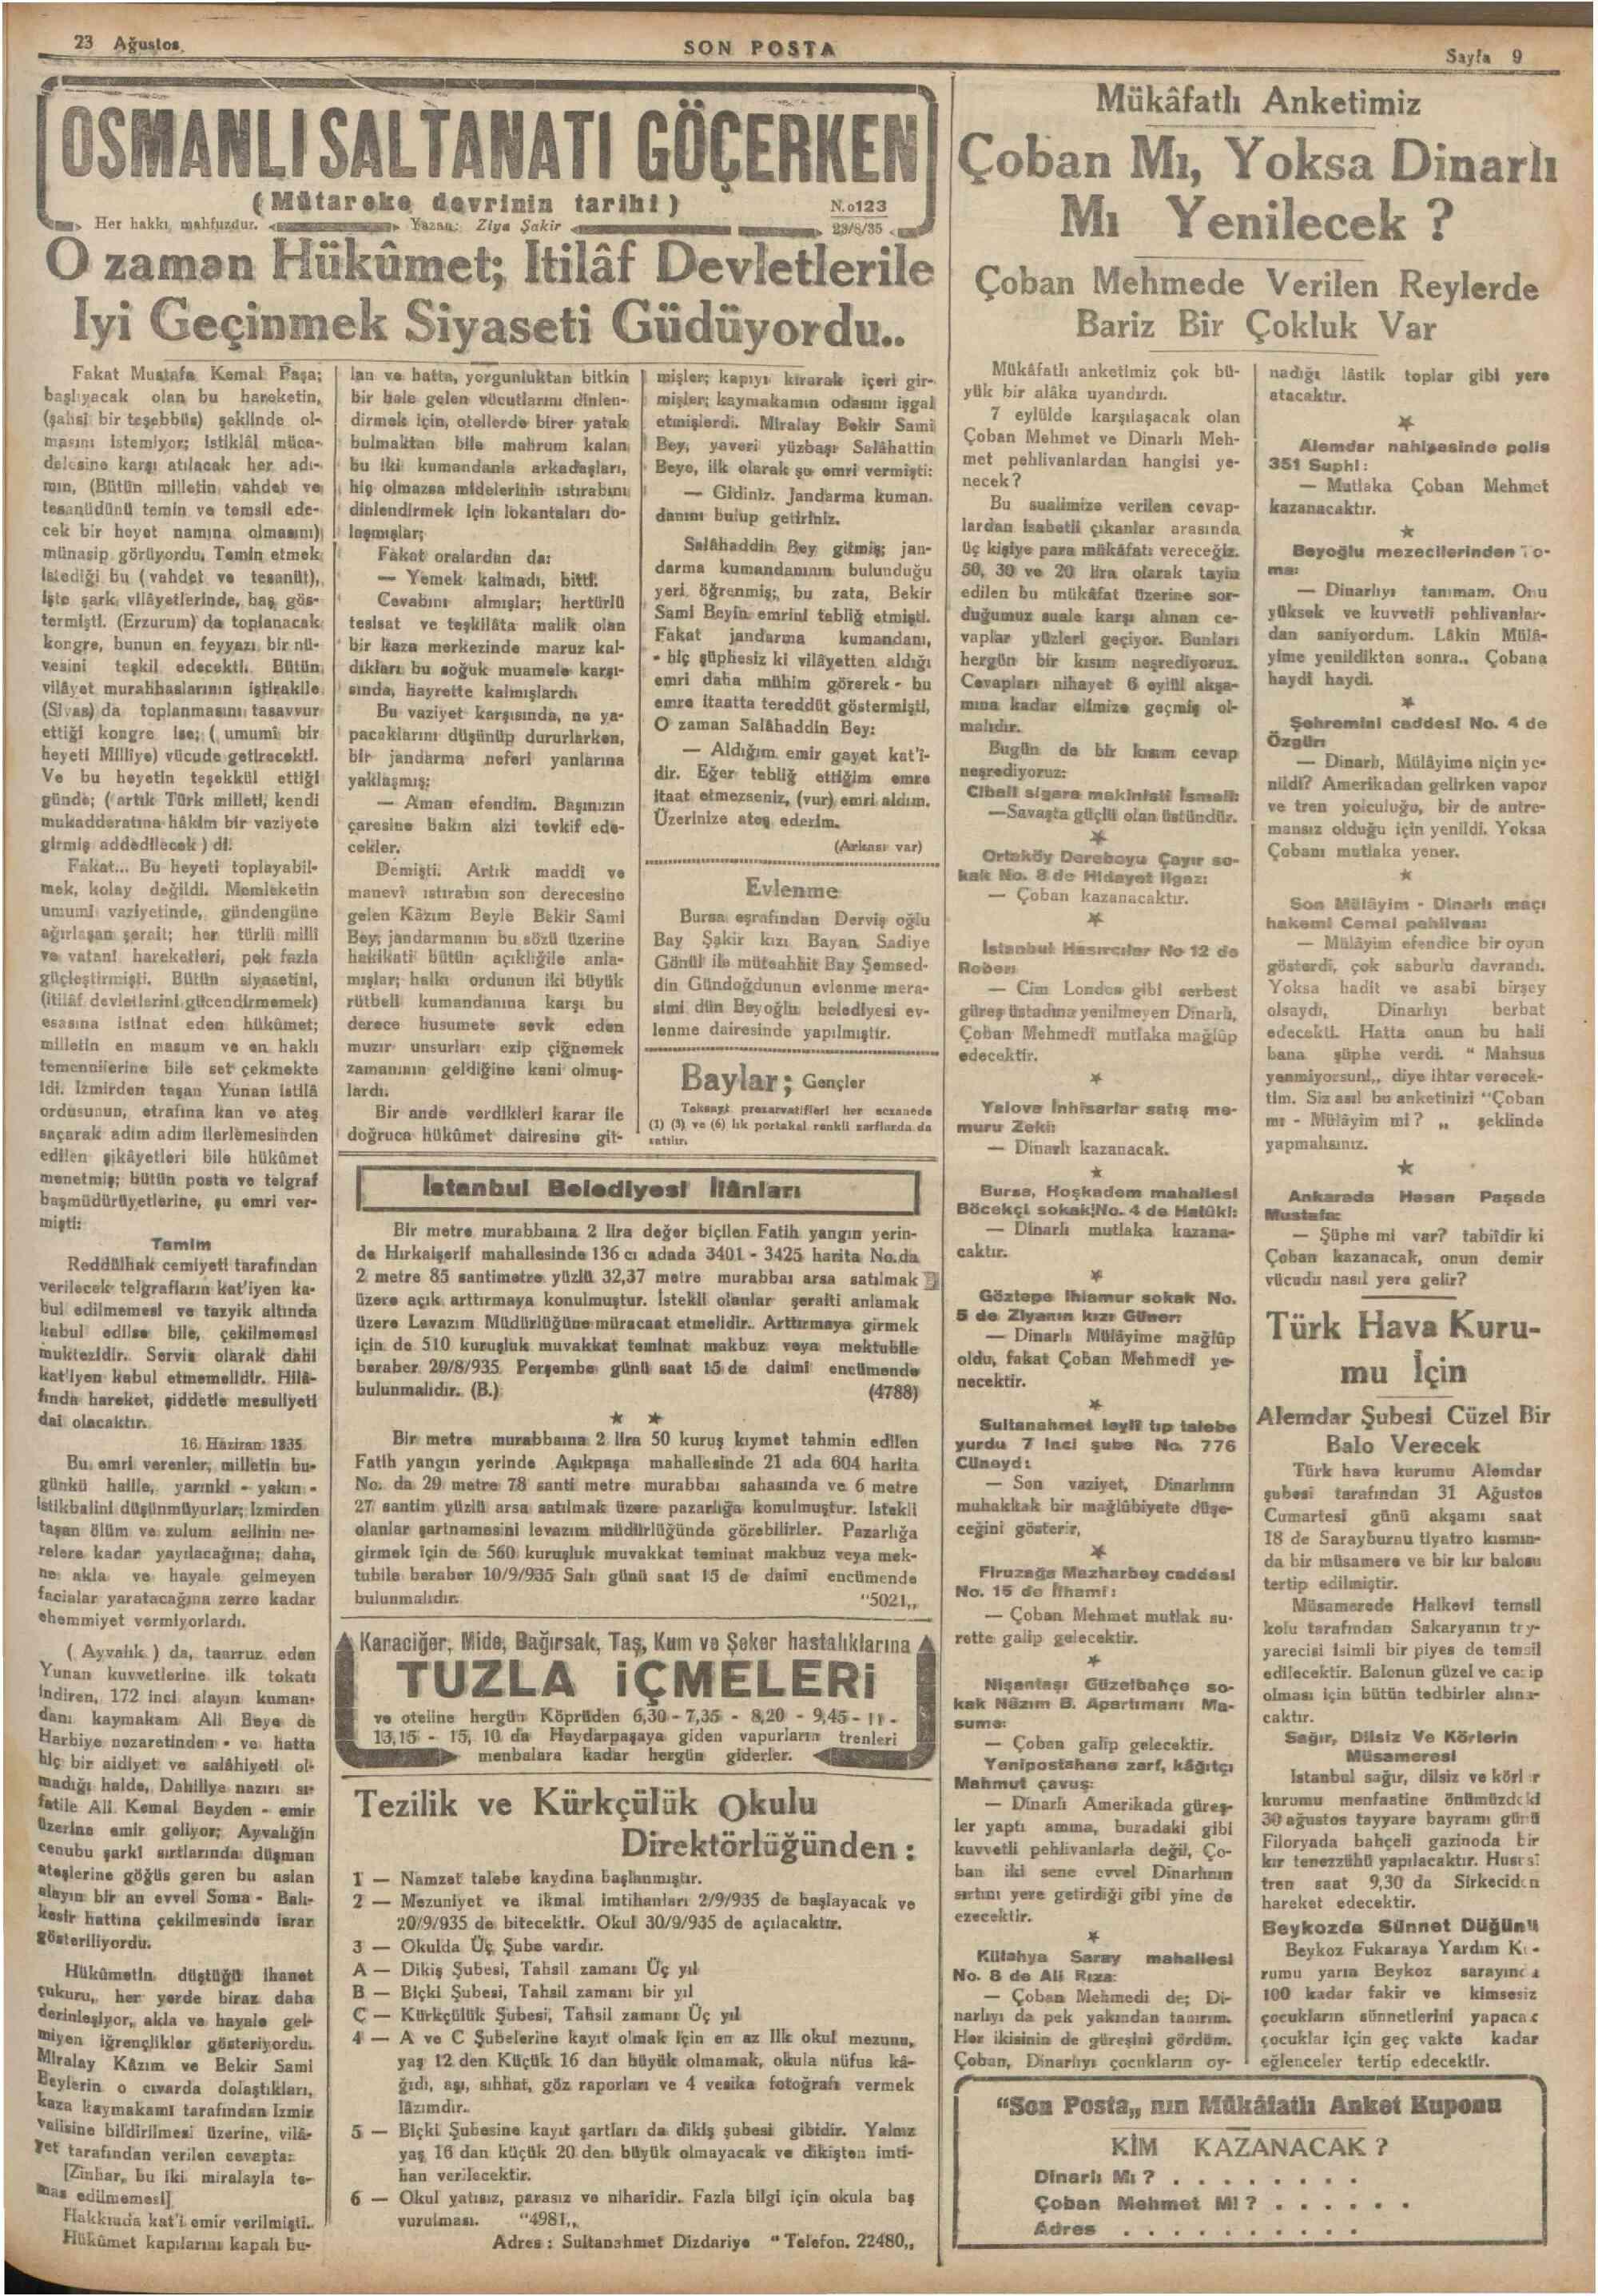 23 Ağustos 1935 Tarihli Son Posta Dergisi Sayfa 5